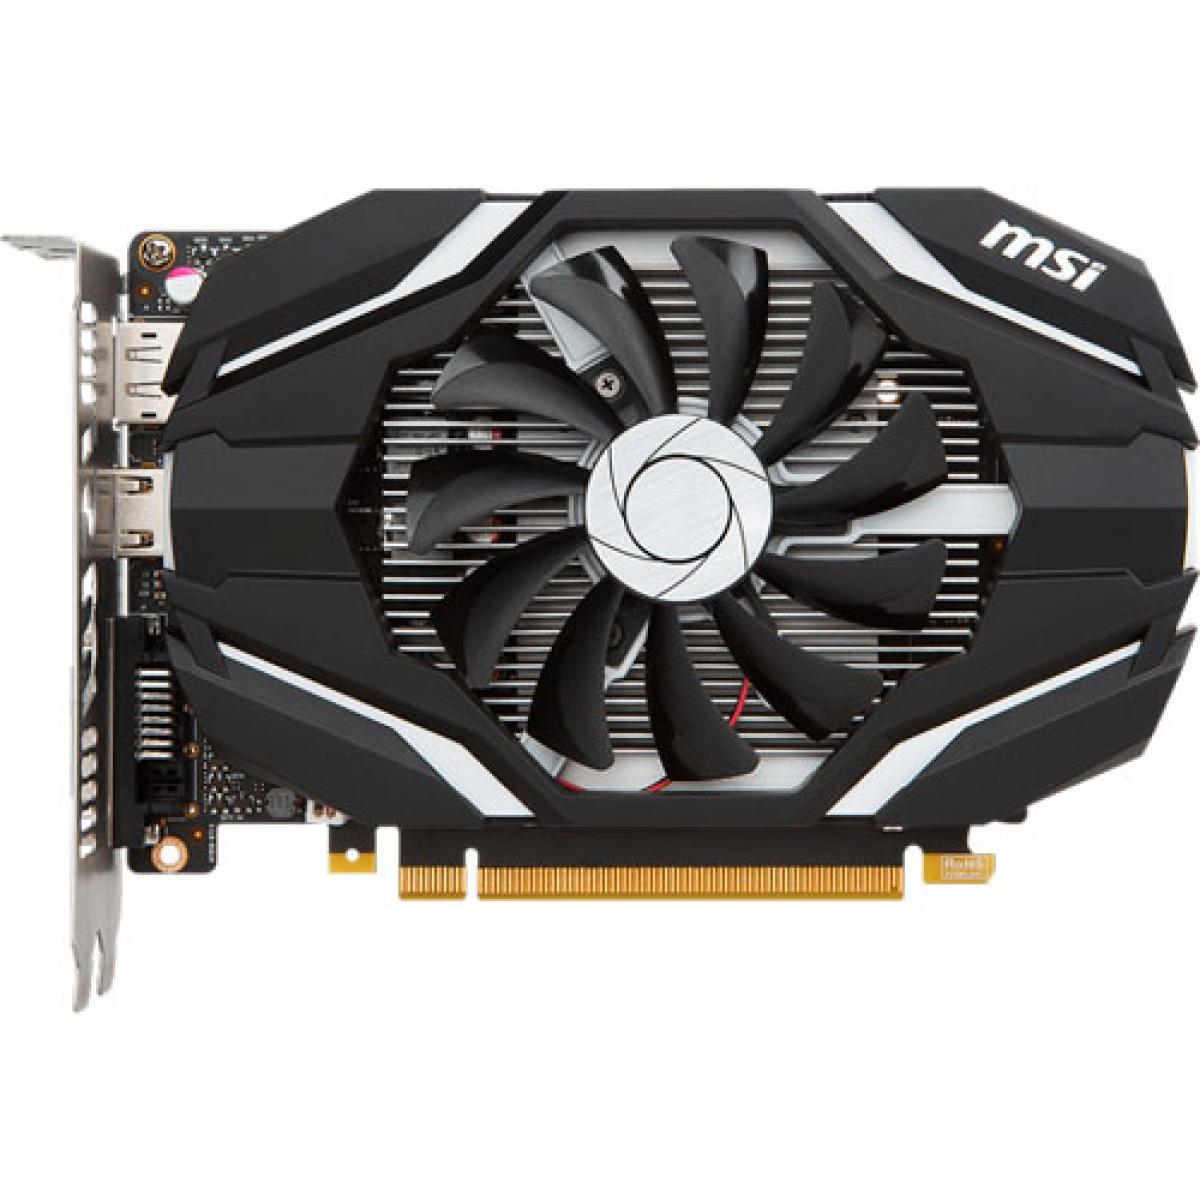 Placa de Vídeo MSI GeForce GTX 1050 Ti 4G OC GDDR5 PCI-EXP 912-V809-2268